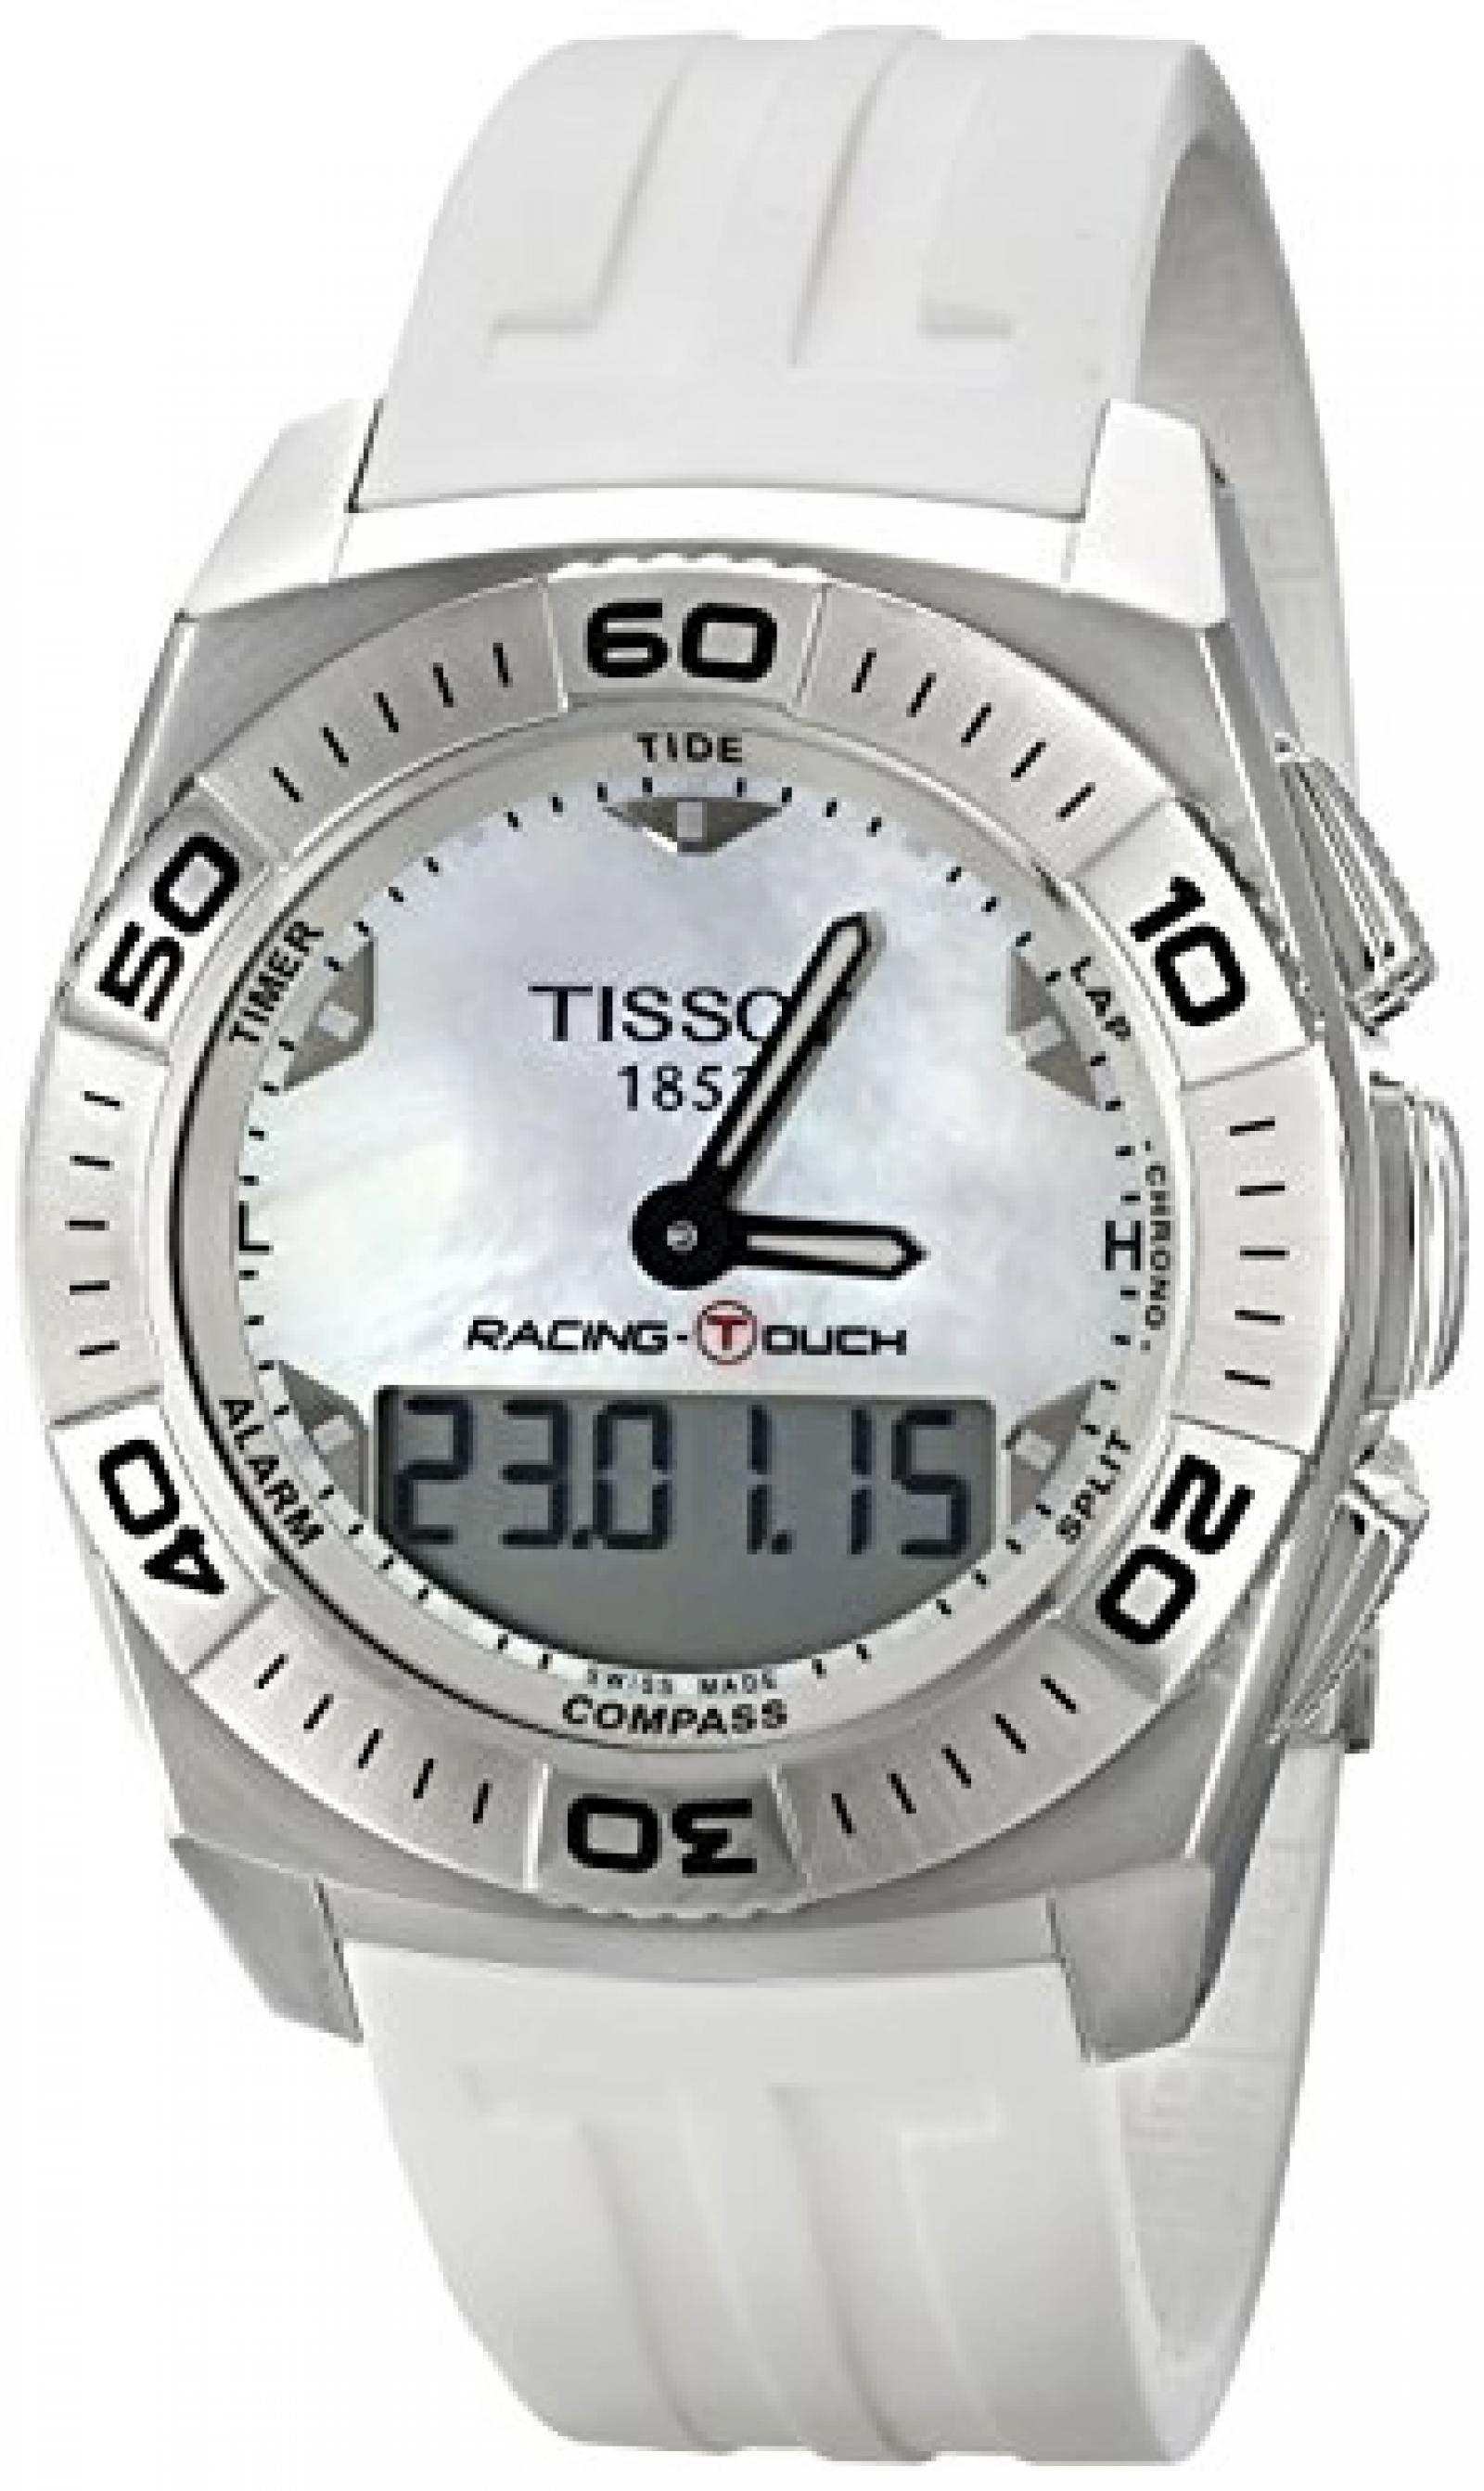 Tissot Herren-Armbanduhr Racing Touch Kautschuk T0025201711100